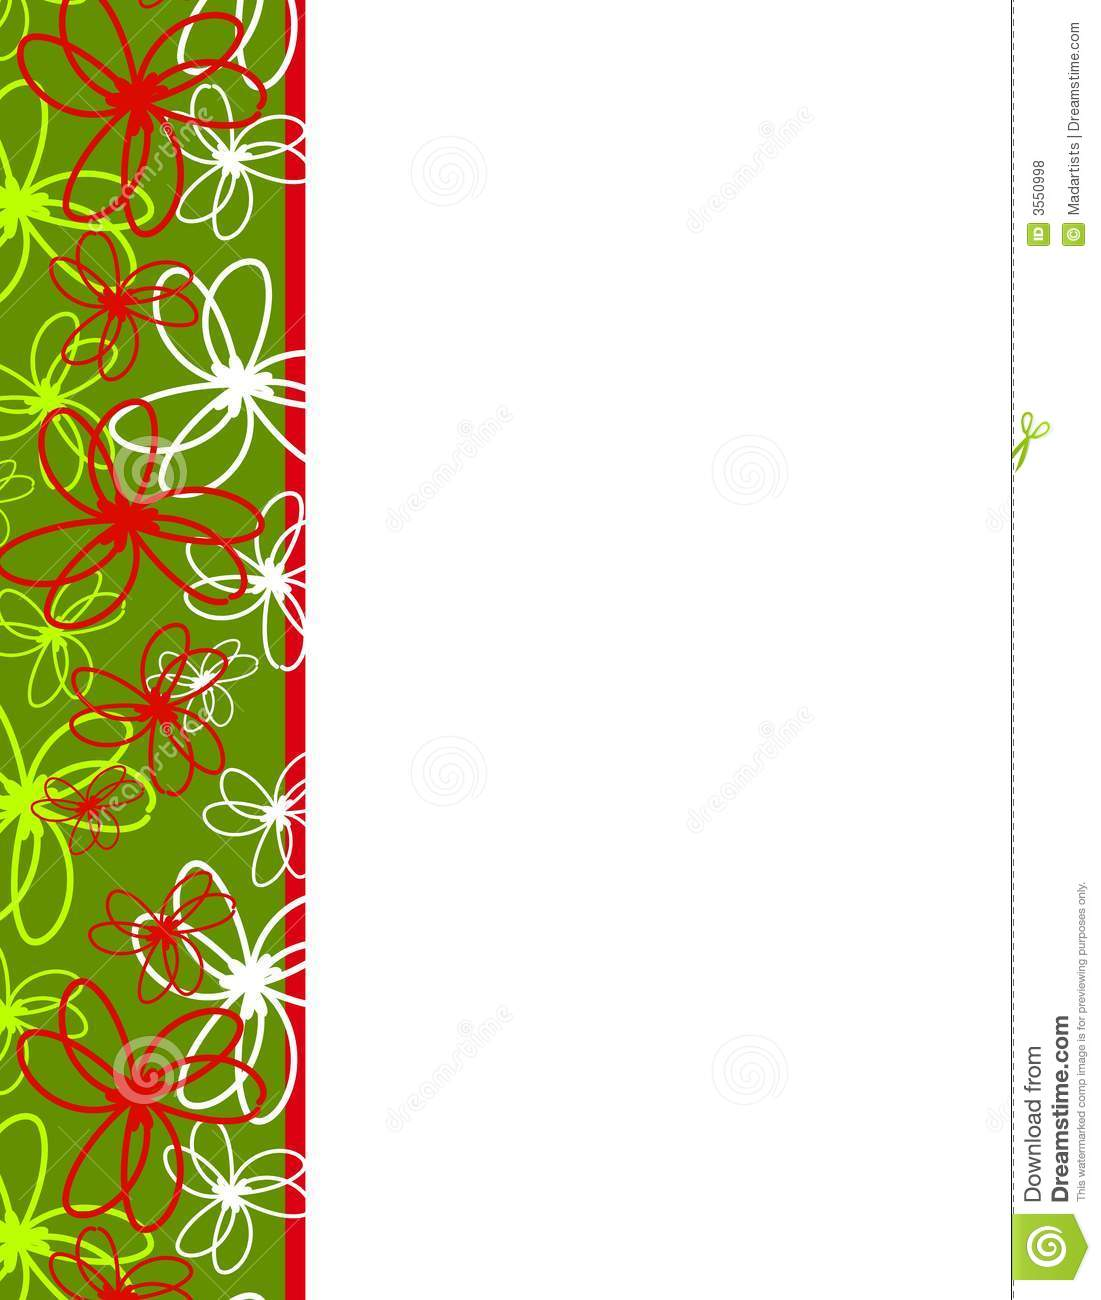 Vintage holiday border clipart download Holiday Clip Art Borders Free | Clipart Panda - Free Clipart Images download